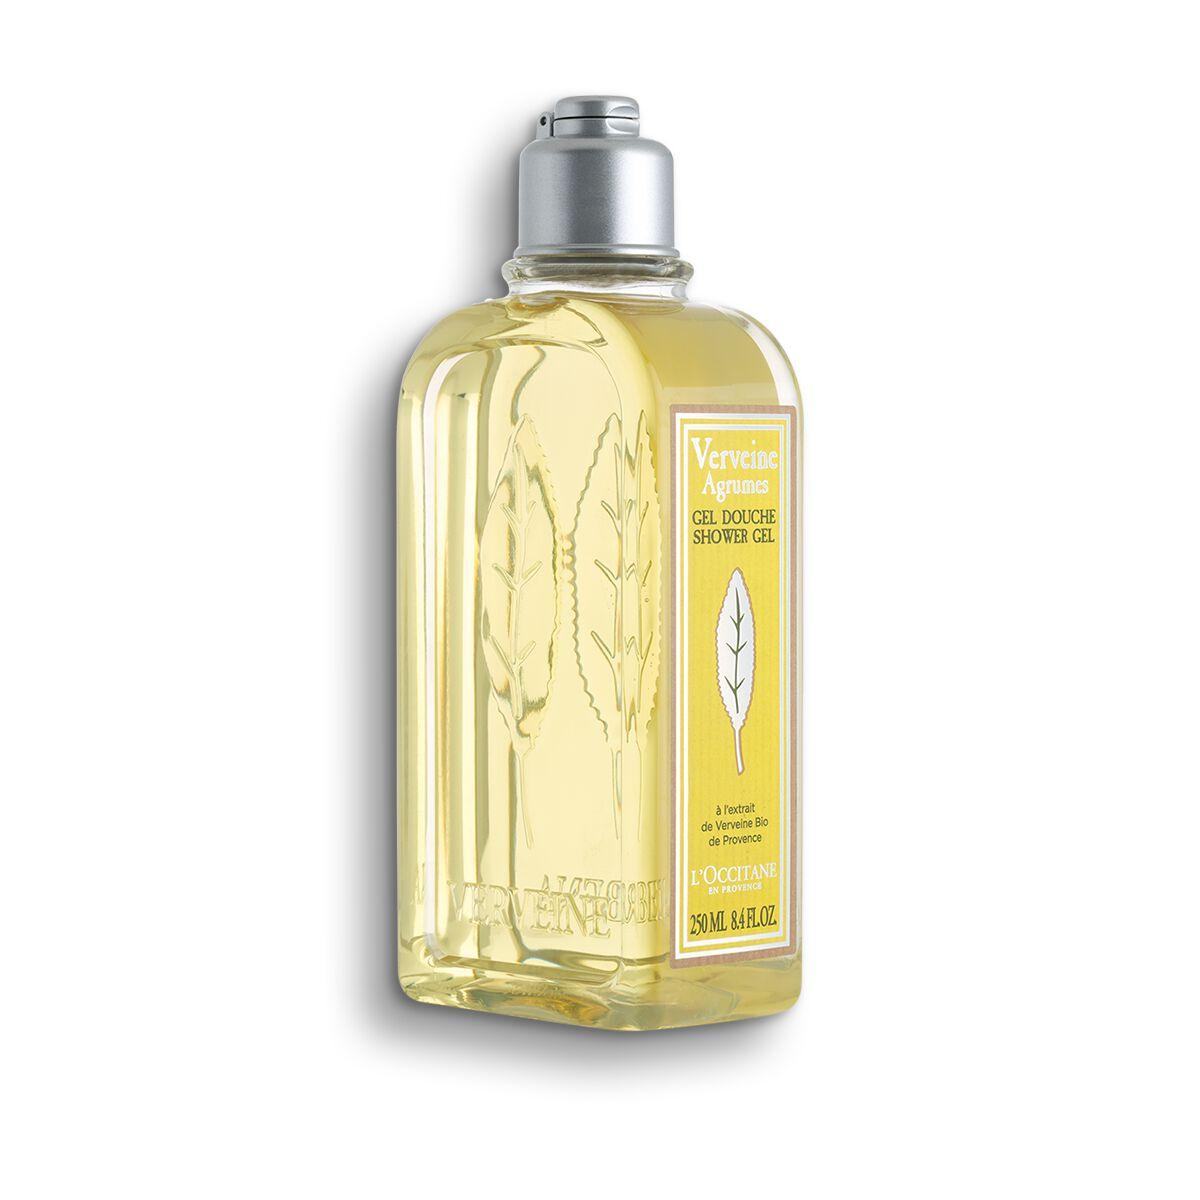 Citrus Verbena Shower Gel 8.4 fl. oz.